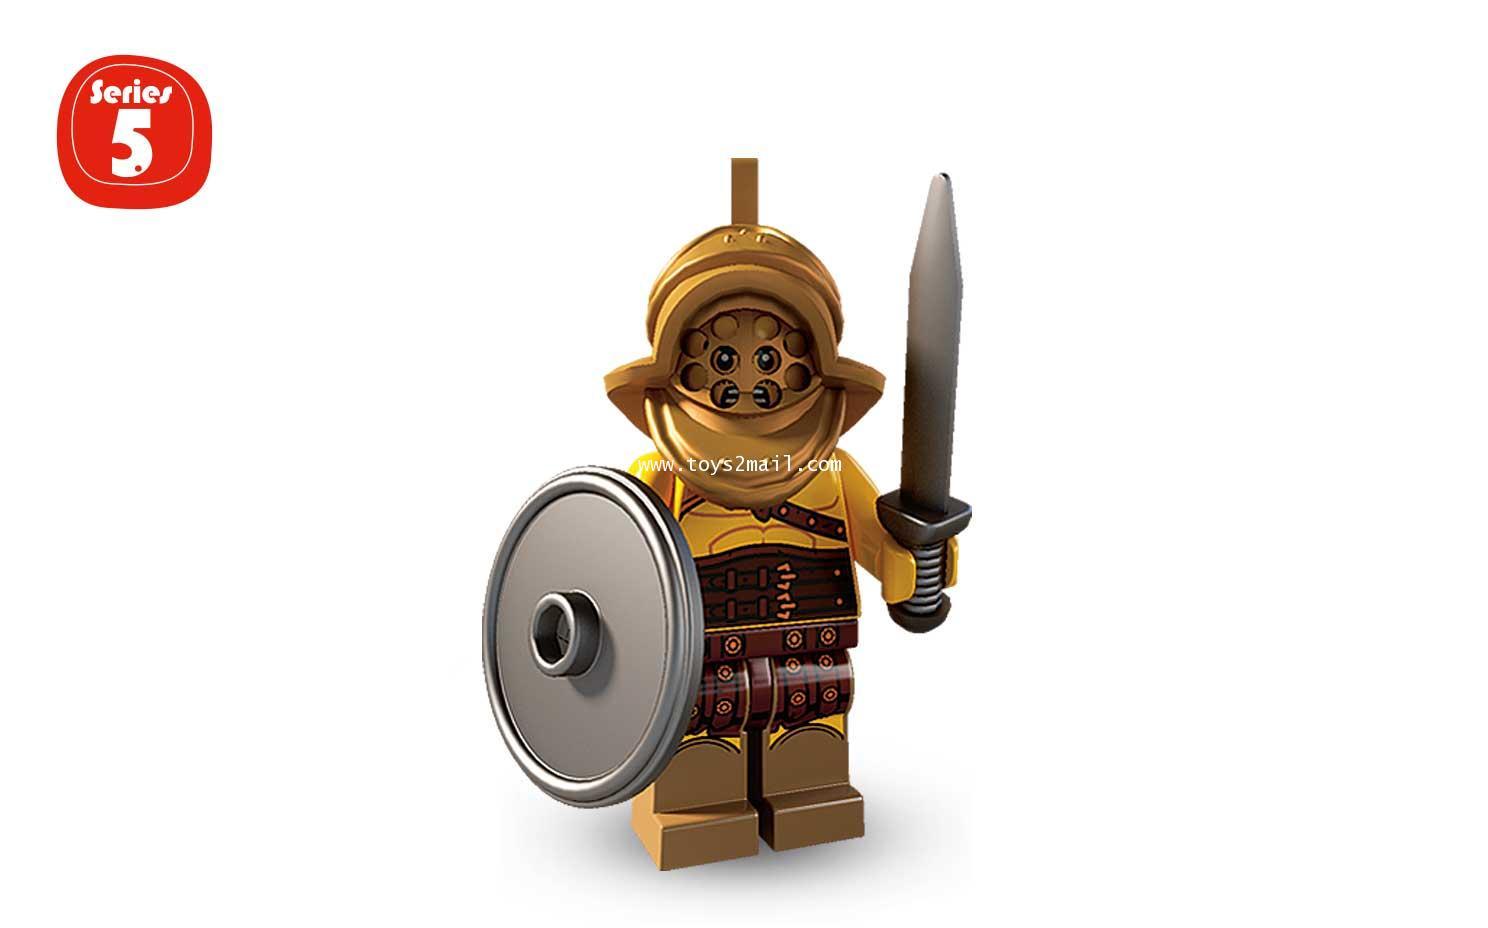 LEGO : LEGO MINI FIGURE SERIES 5 : No.02 GLADIATOR การ์ดิเอเตอร์ [SOLD OUT]